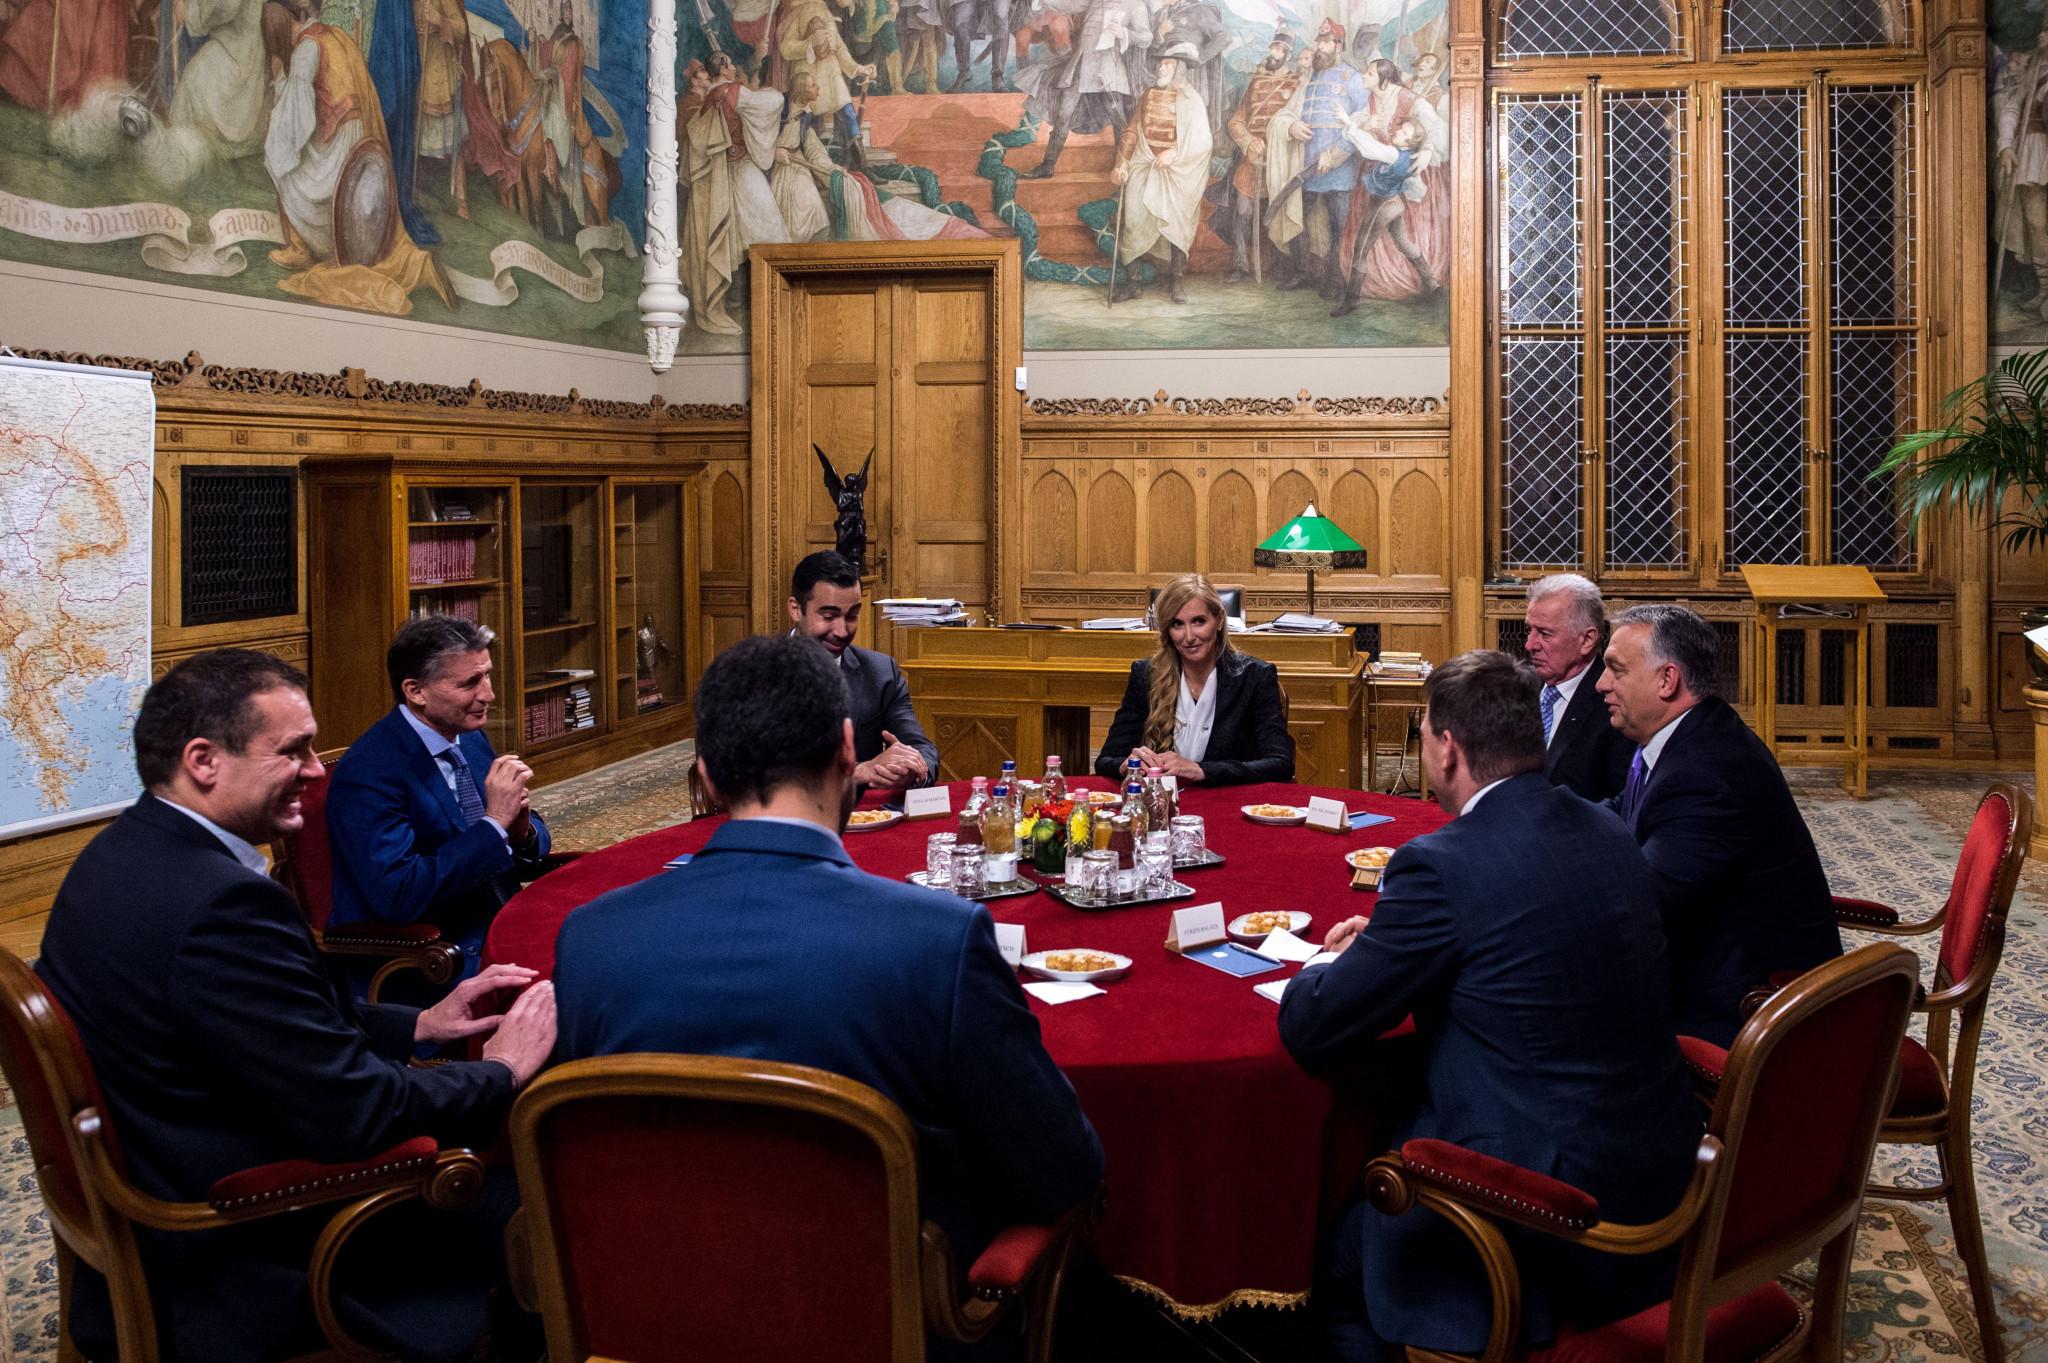 Sebastian Coe met a high-level delegation in Budapest, including Hungarian Prime Minister Viktor Orbán ©Hungarian Government